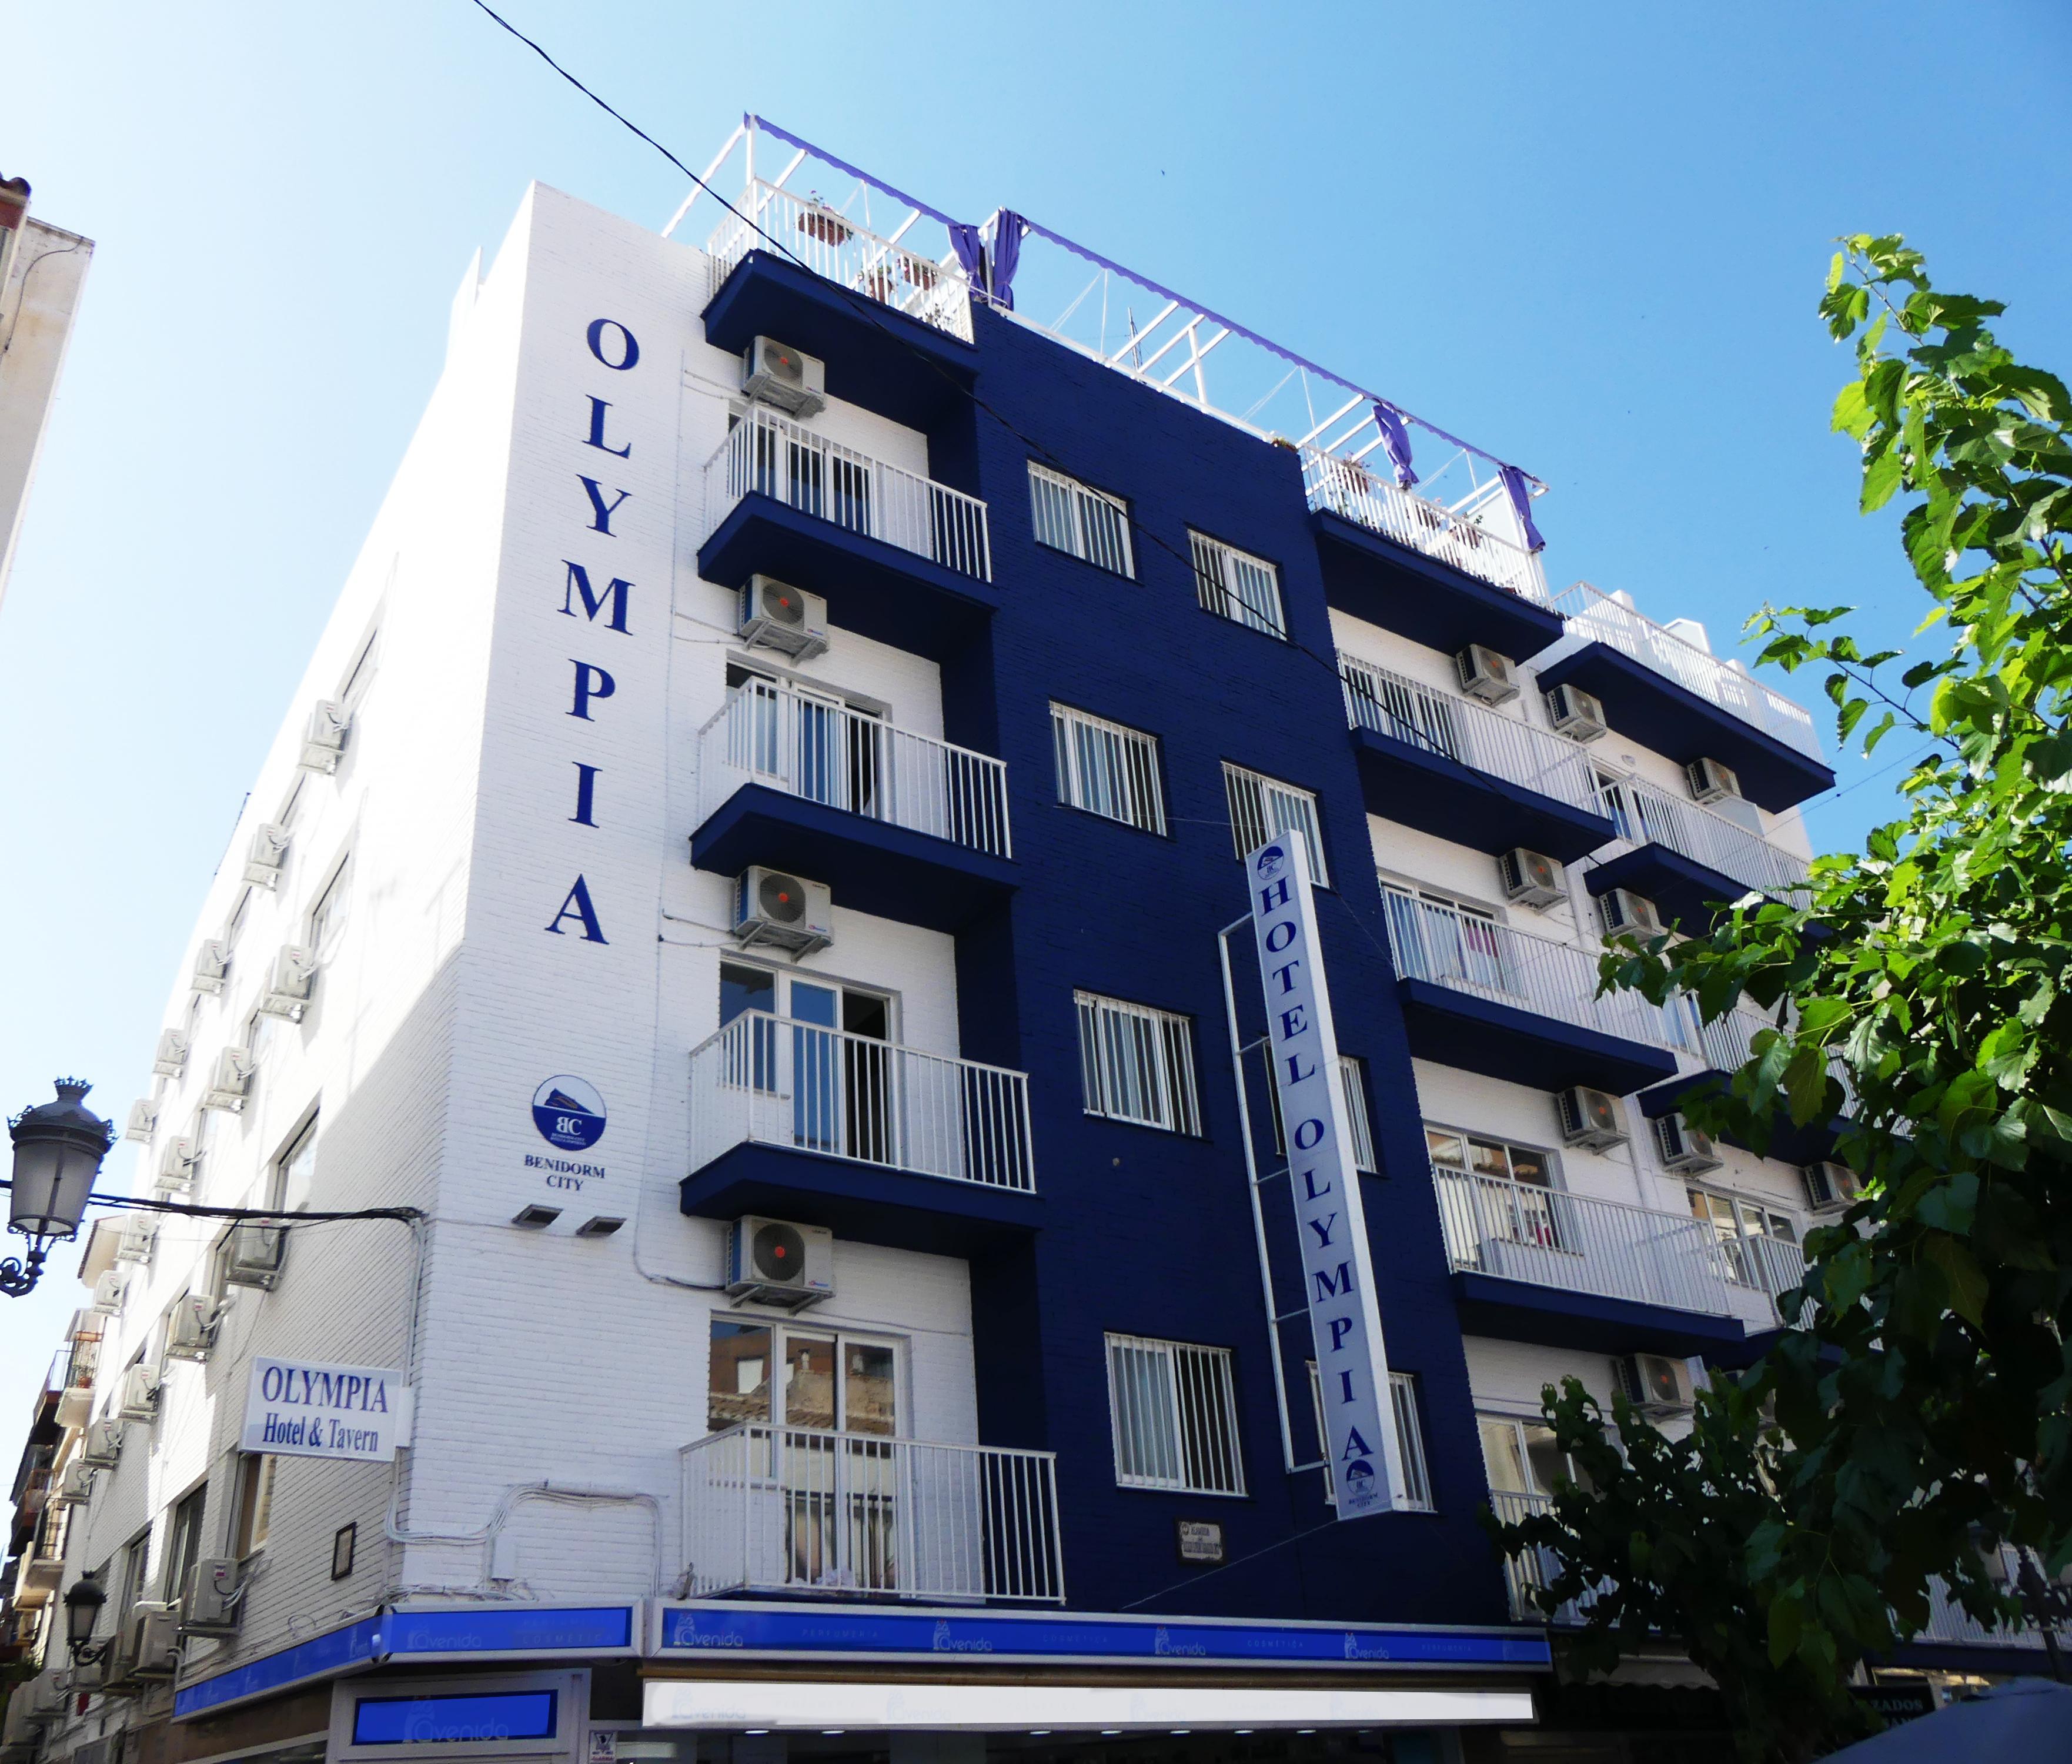 Benidorm City Olympia Hotel Benidorm Alkaen 19 Logitravel